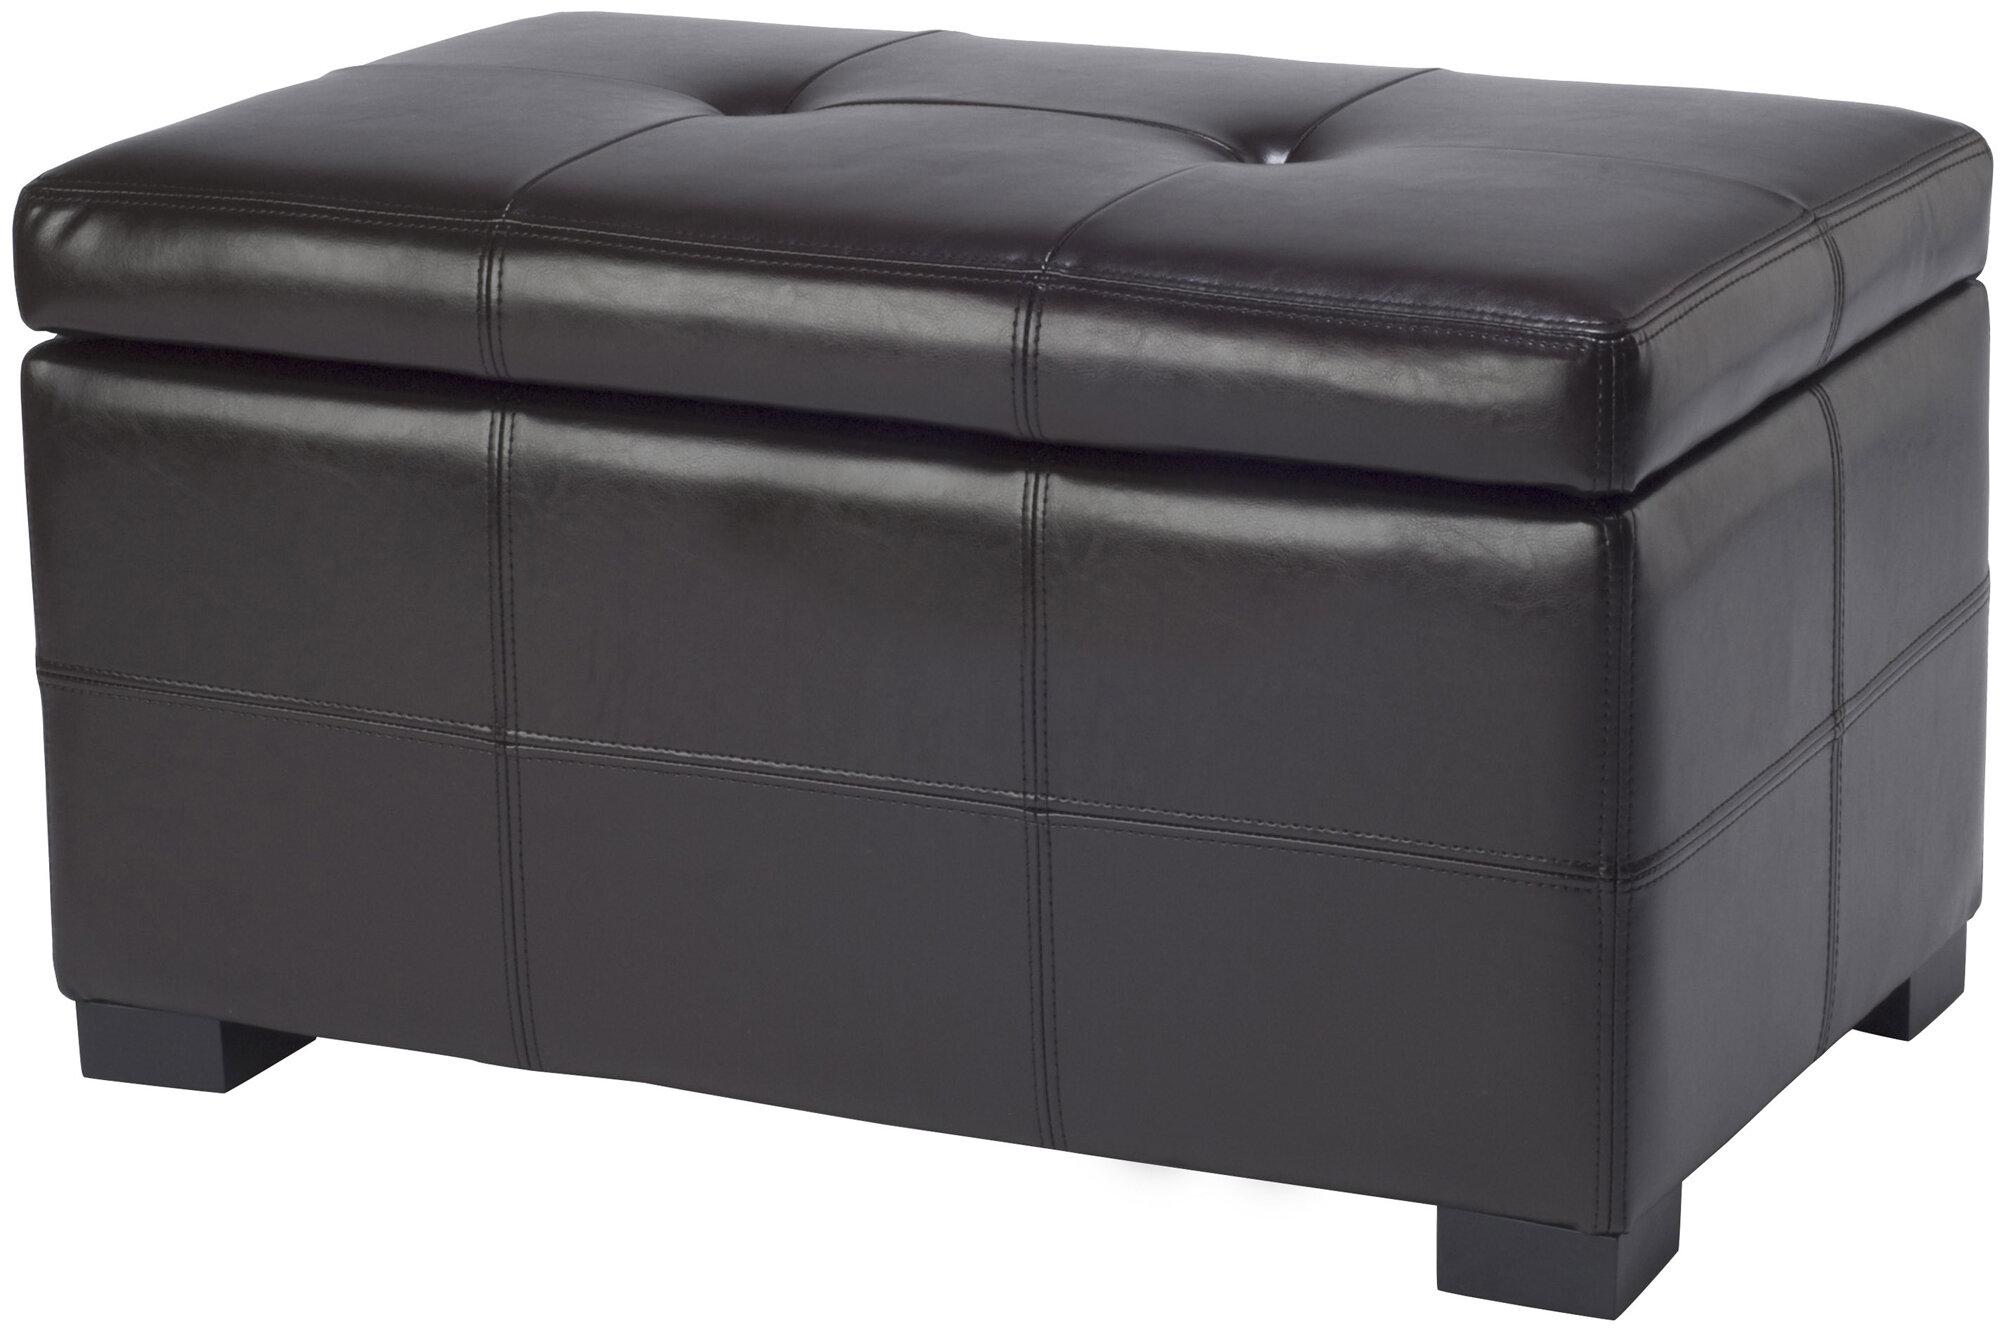 Astounding Maiden Leather Tufted Storage Ottoman Inzonedesignstudio Interior Chair Design Inzonedesignstudiocom